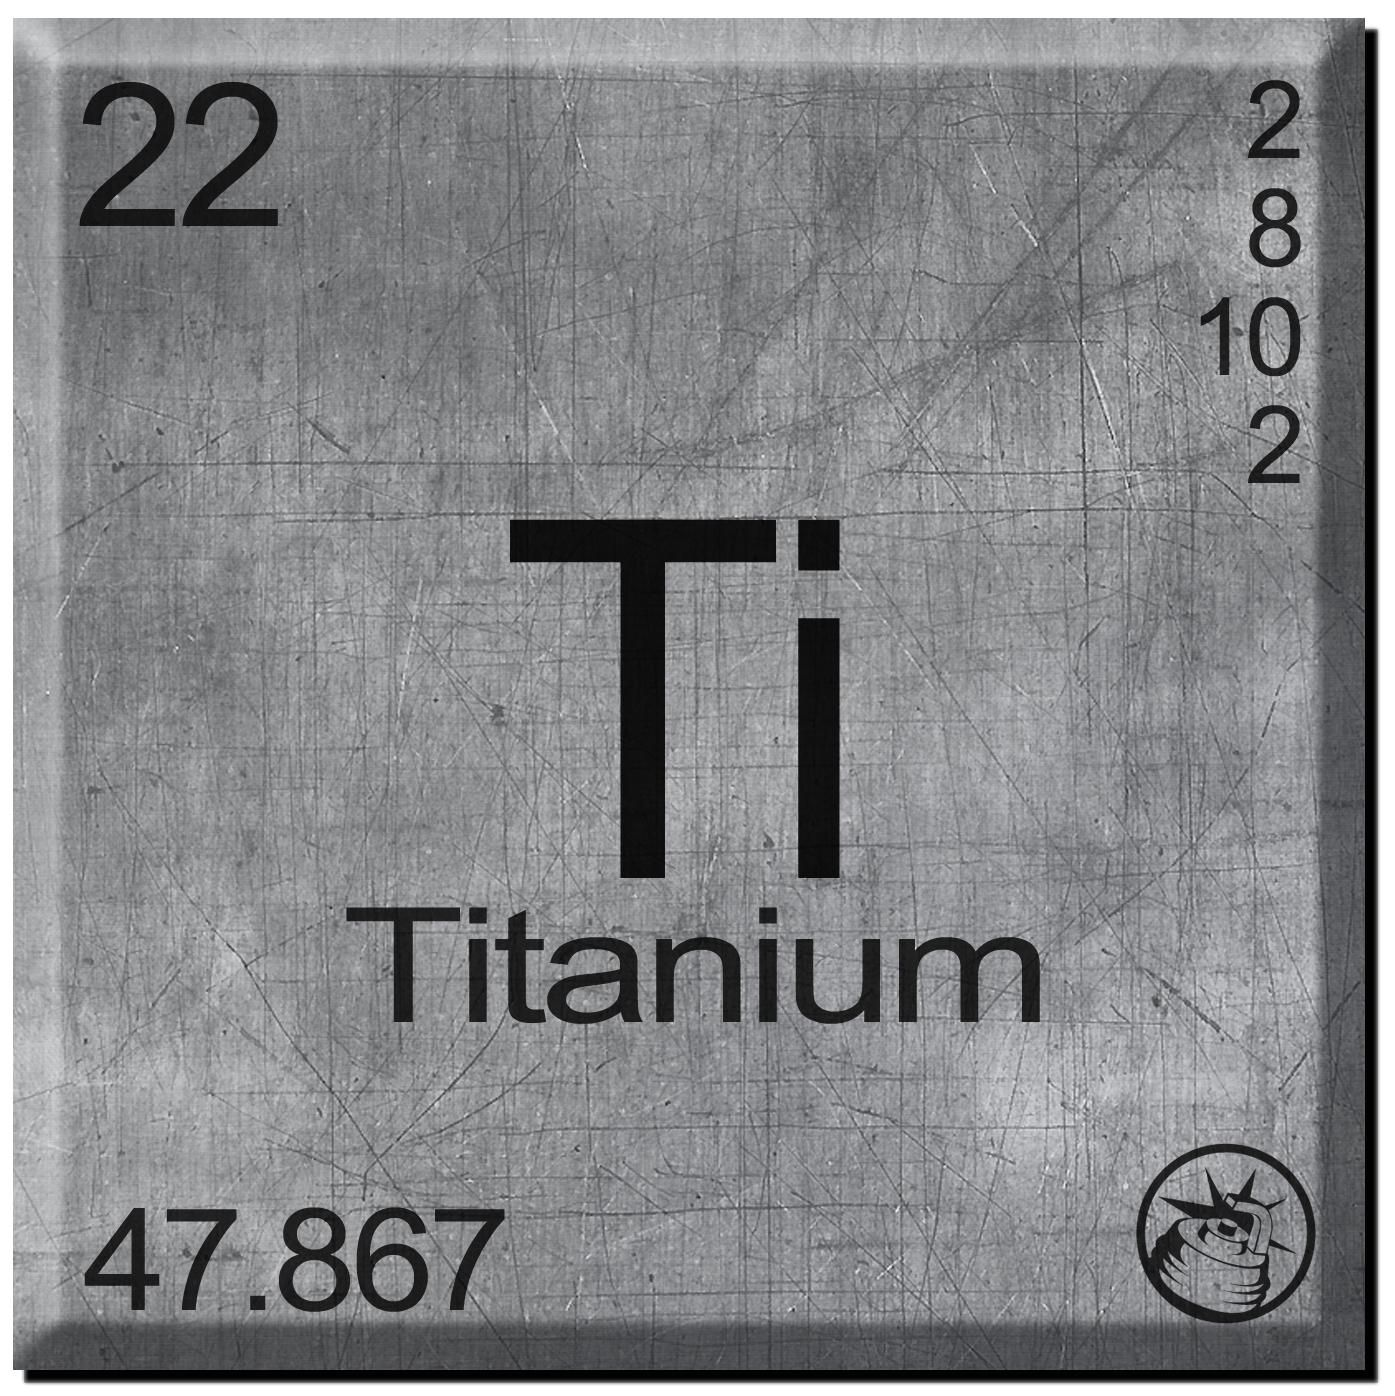 Yttrium slogans element slogans pinterest atomic number yttrium slogans element slogans pinterest atomic number symbols and metallic gamestrikefo Image collections